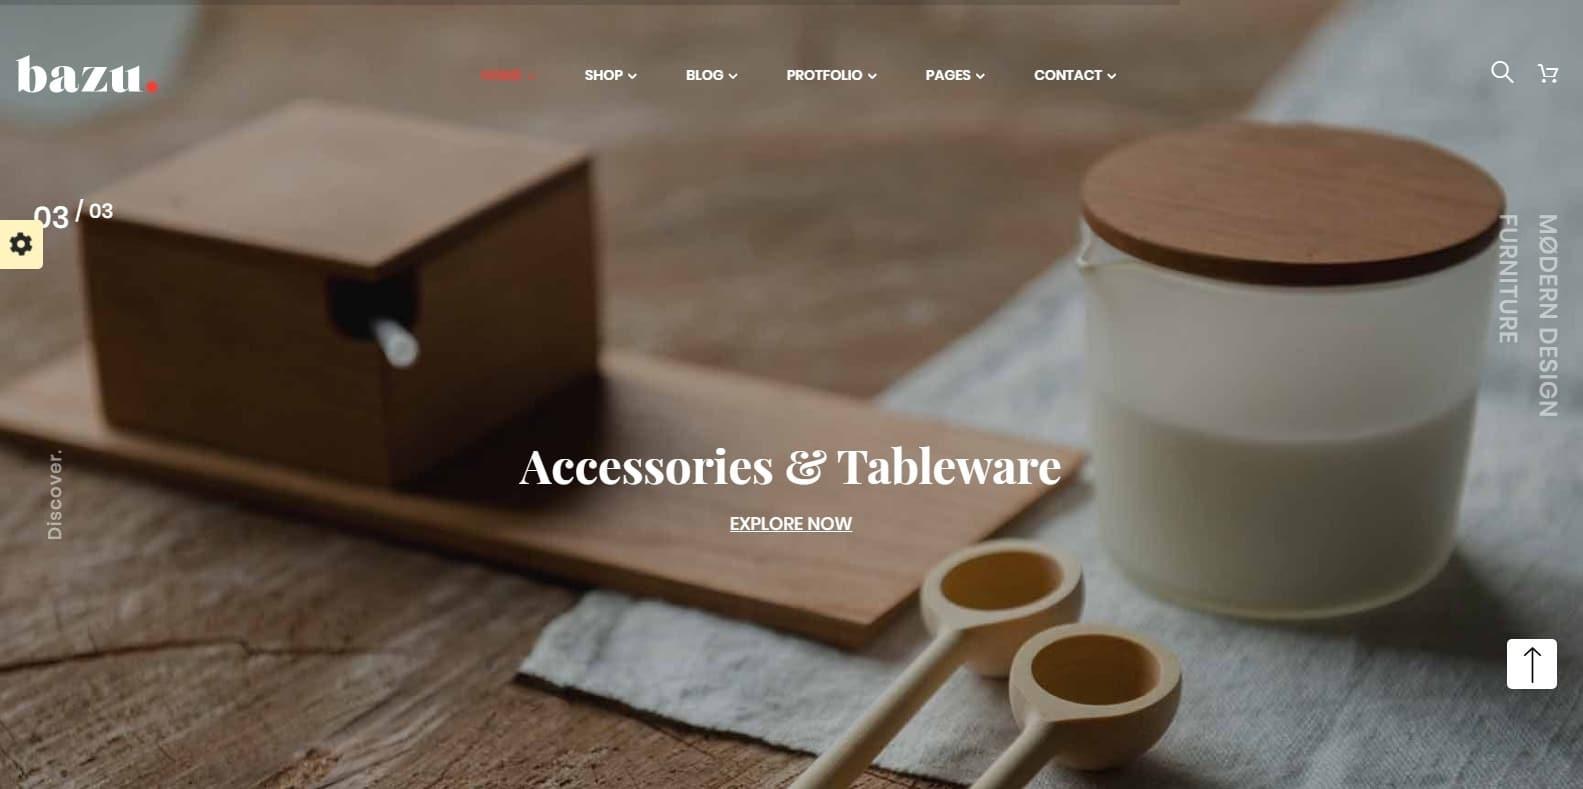 bazu-bookstore-website-template